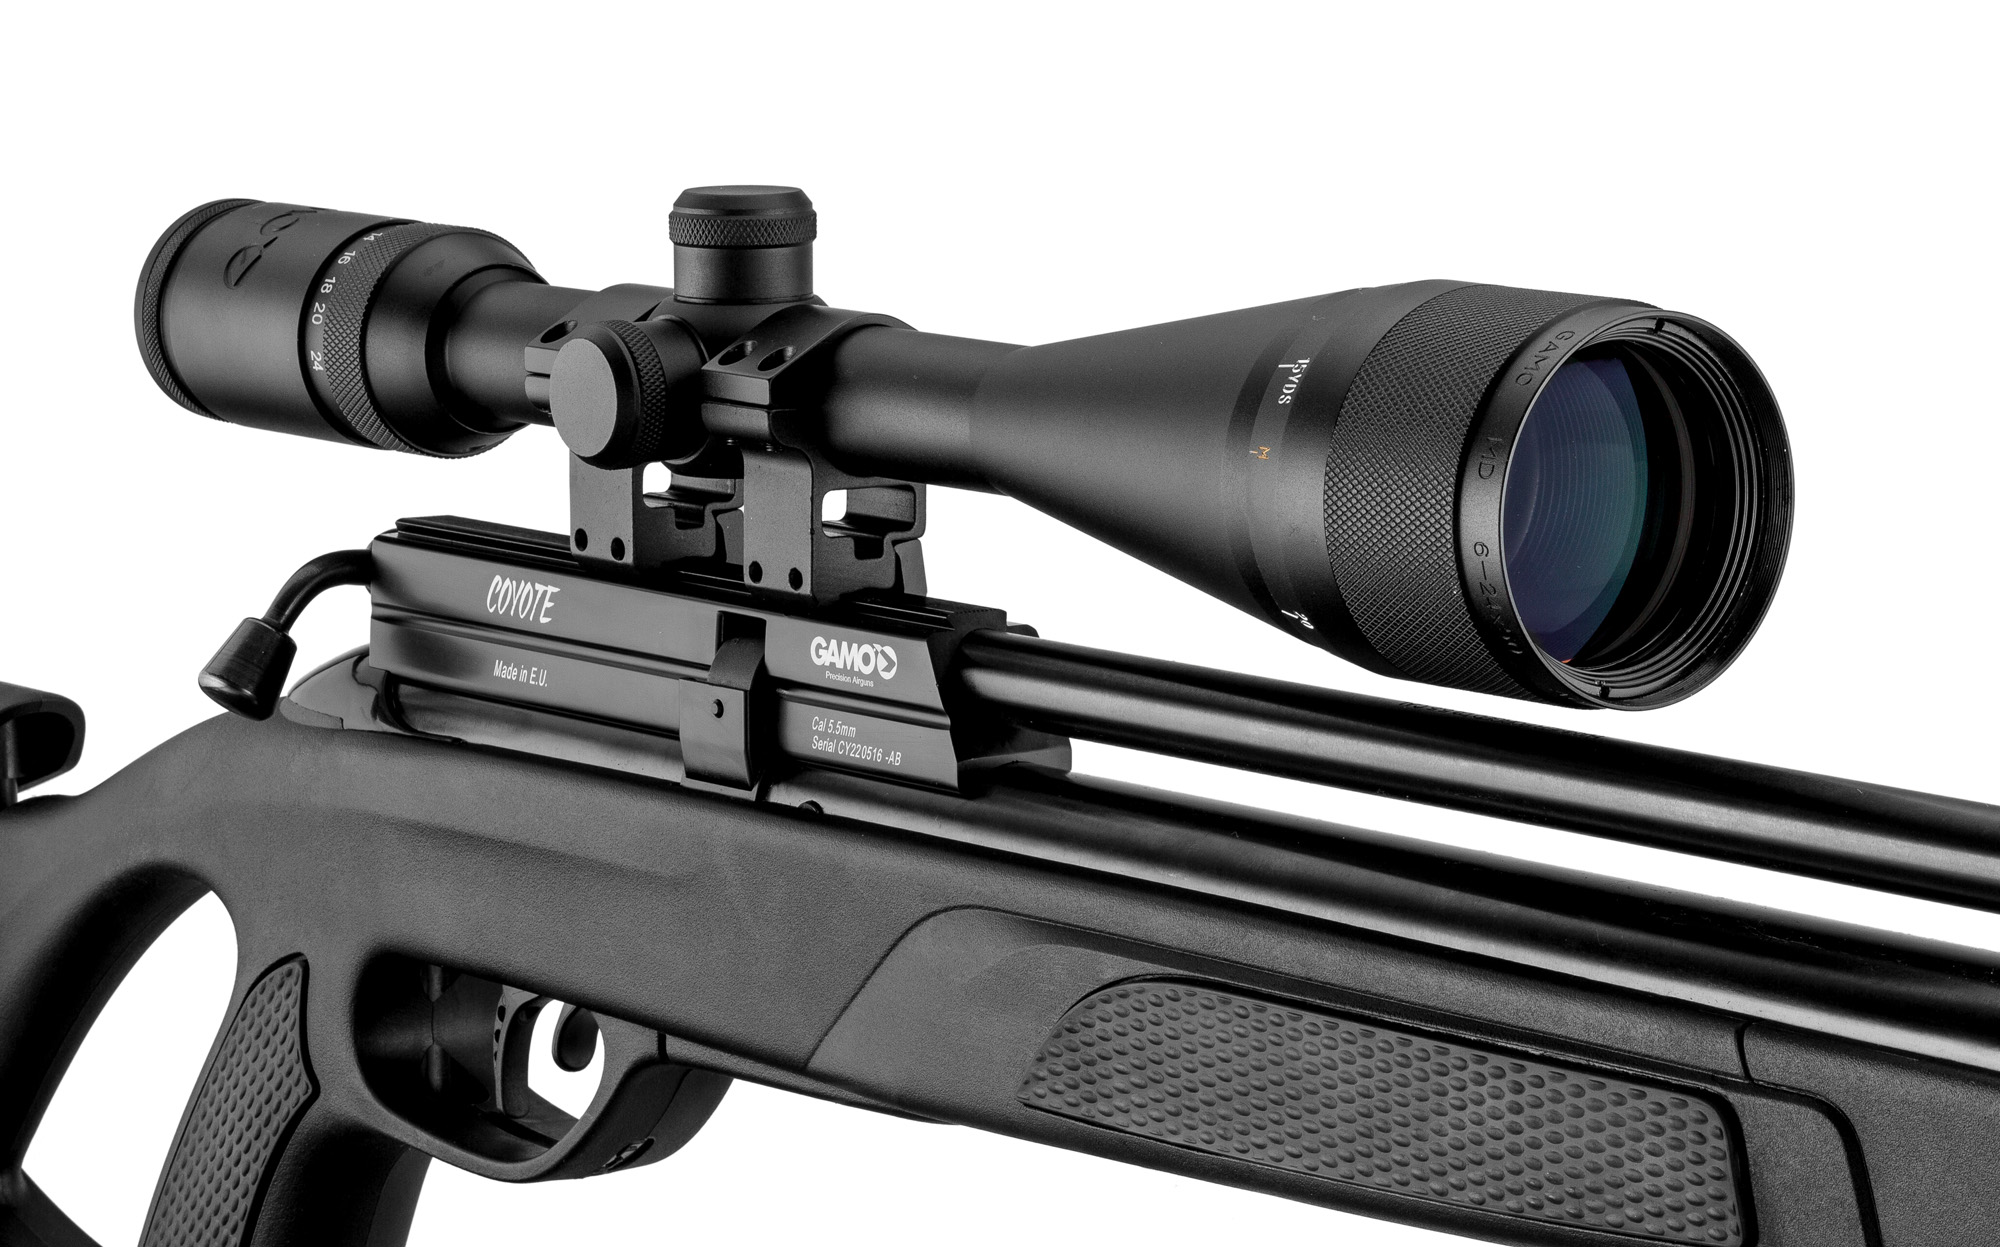 Pack carabine Gamo PCP Coyote cal. 5,5 mm